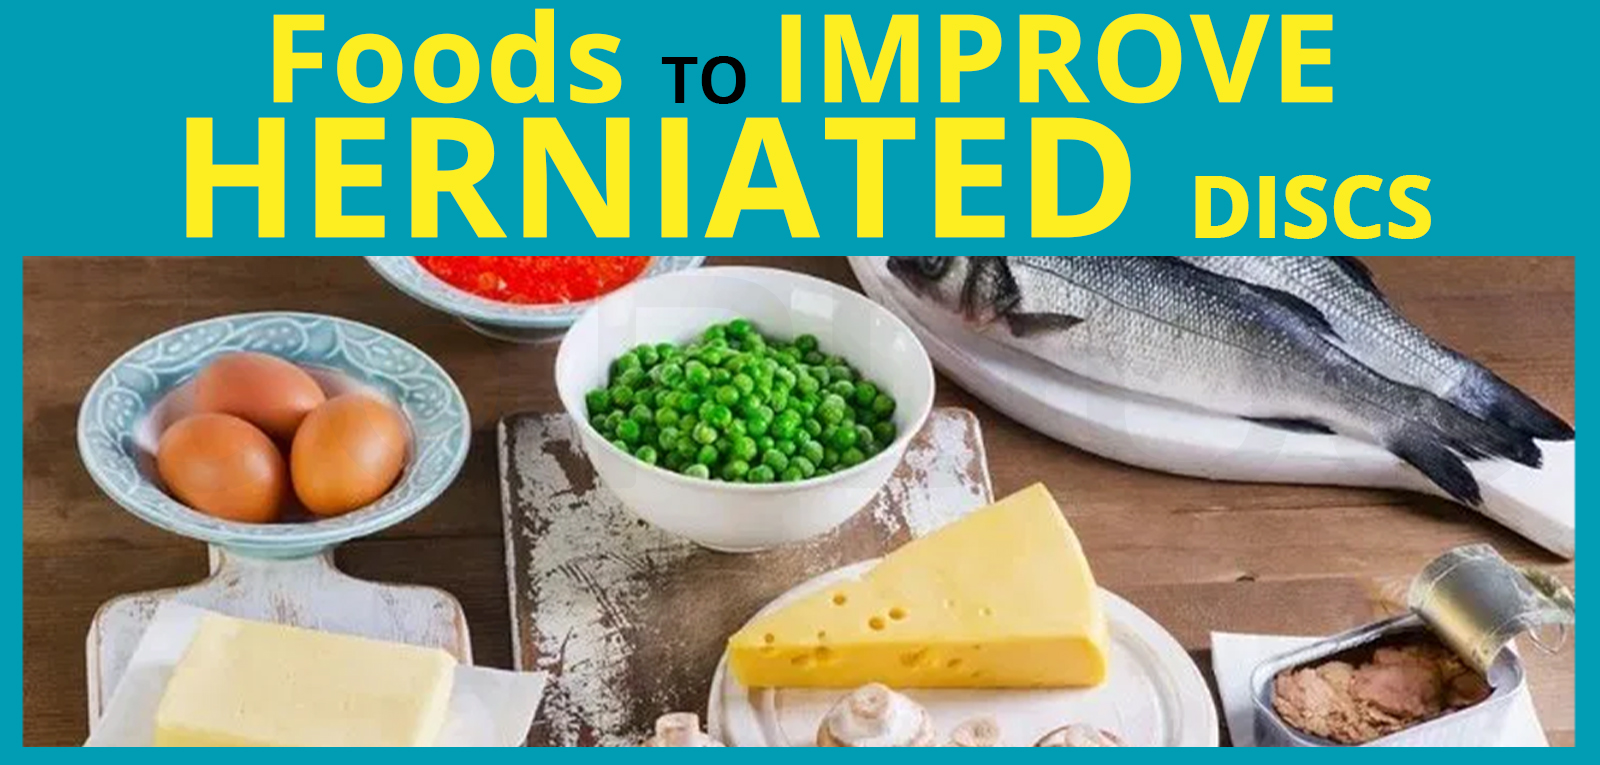 Foods to improve herniated discs